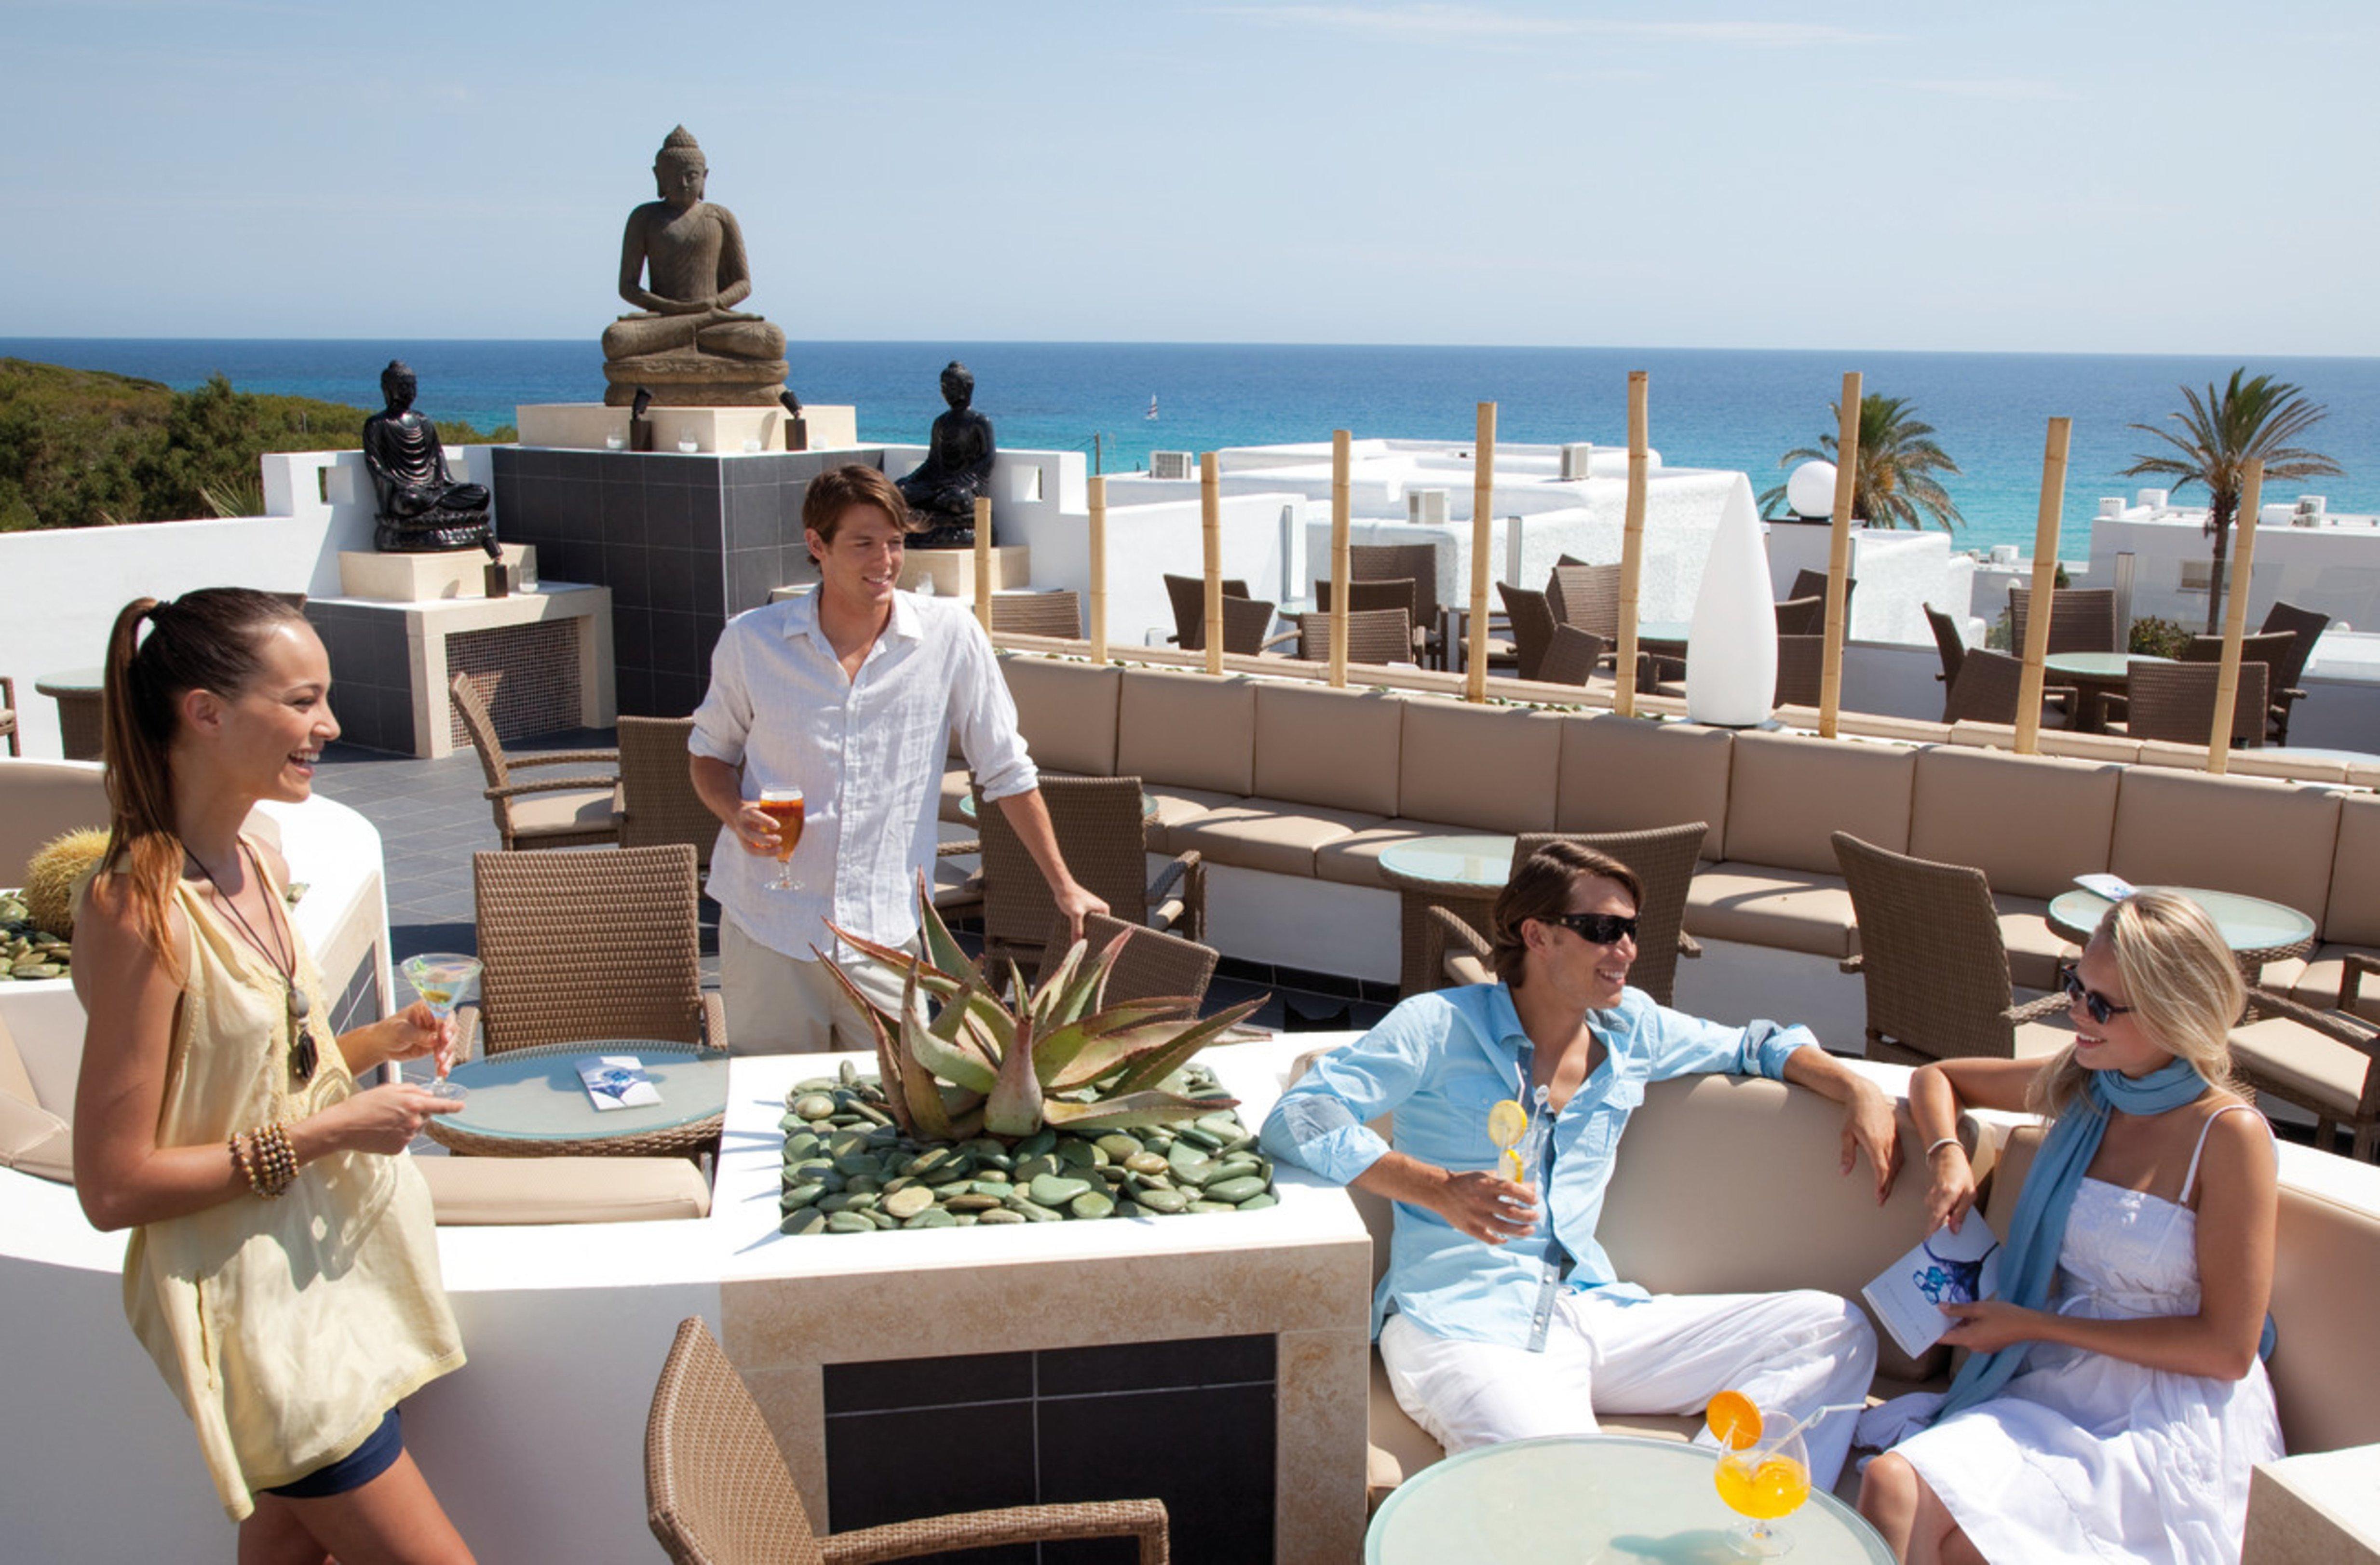 Hotel Riu La Mola, situated in Formentera